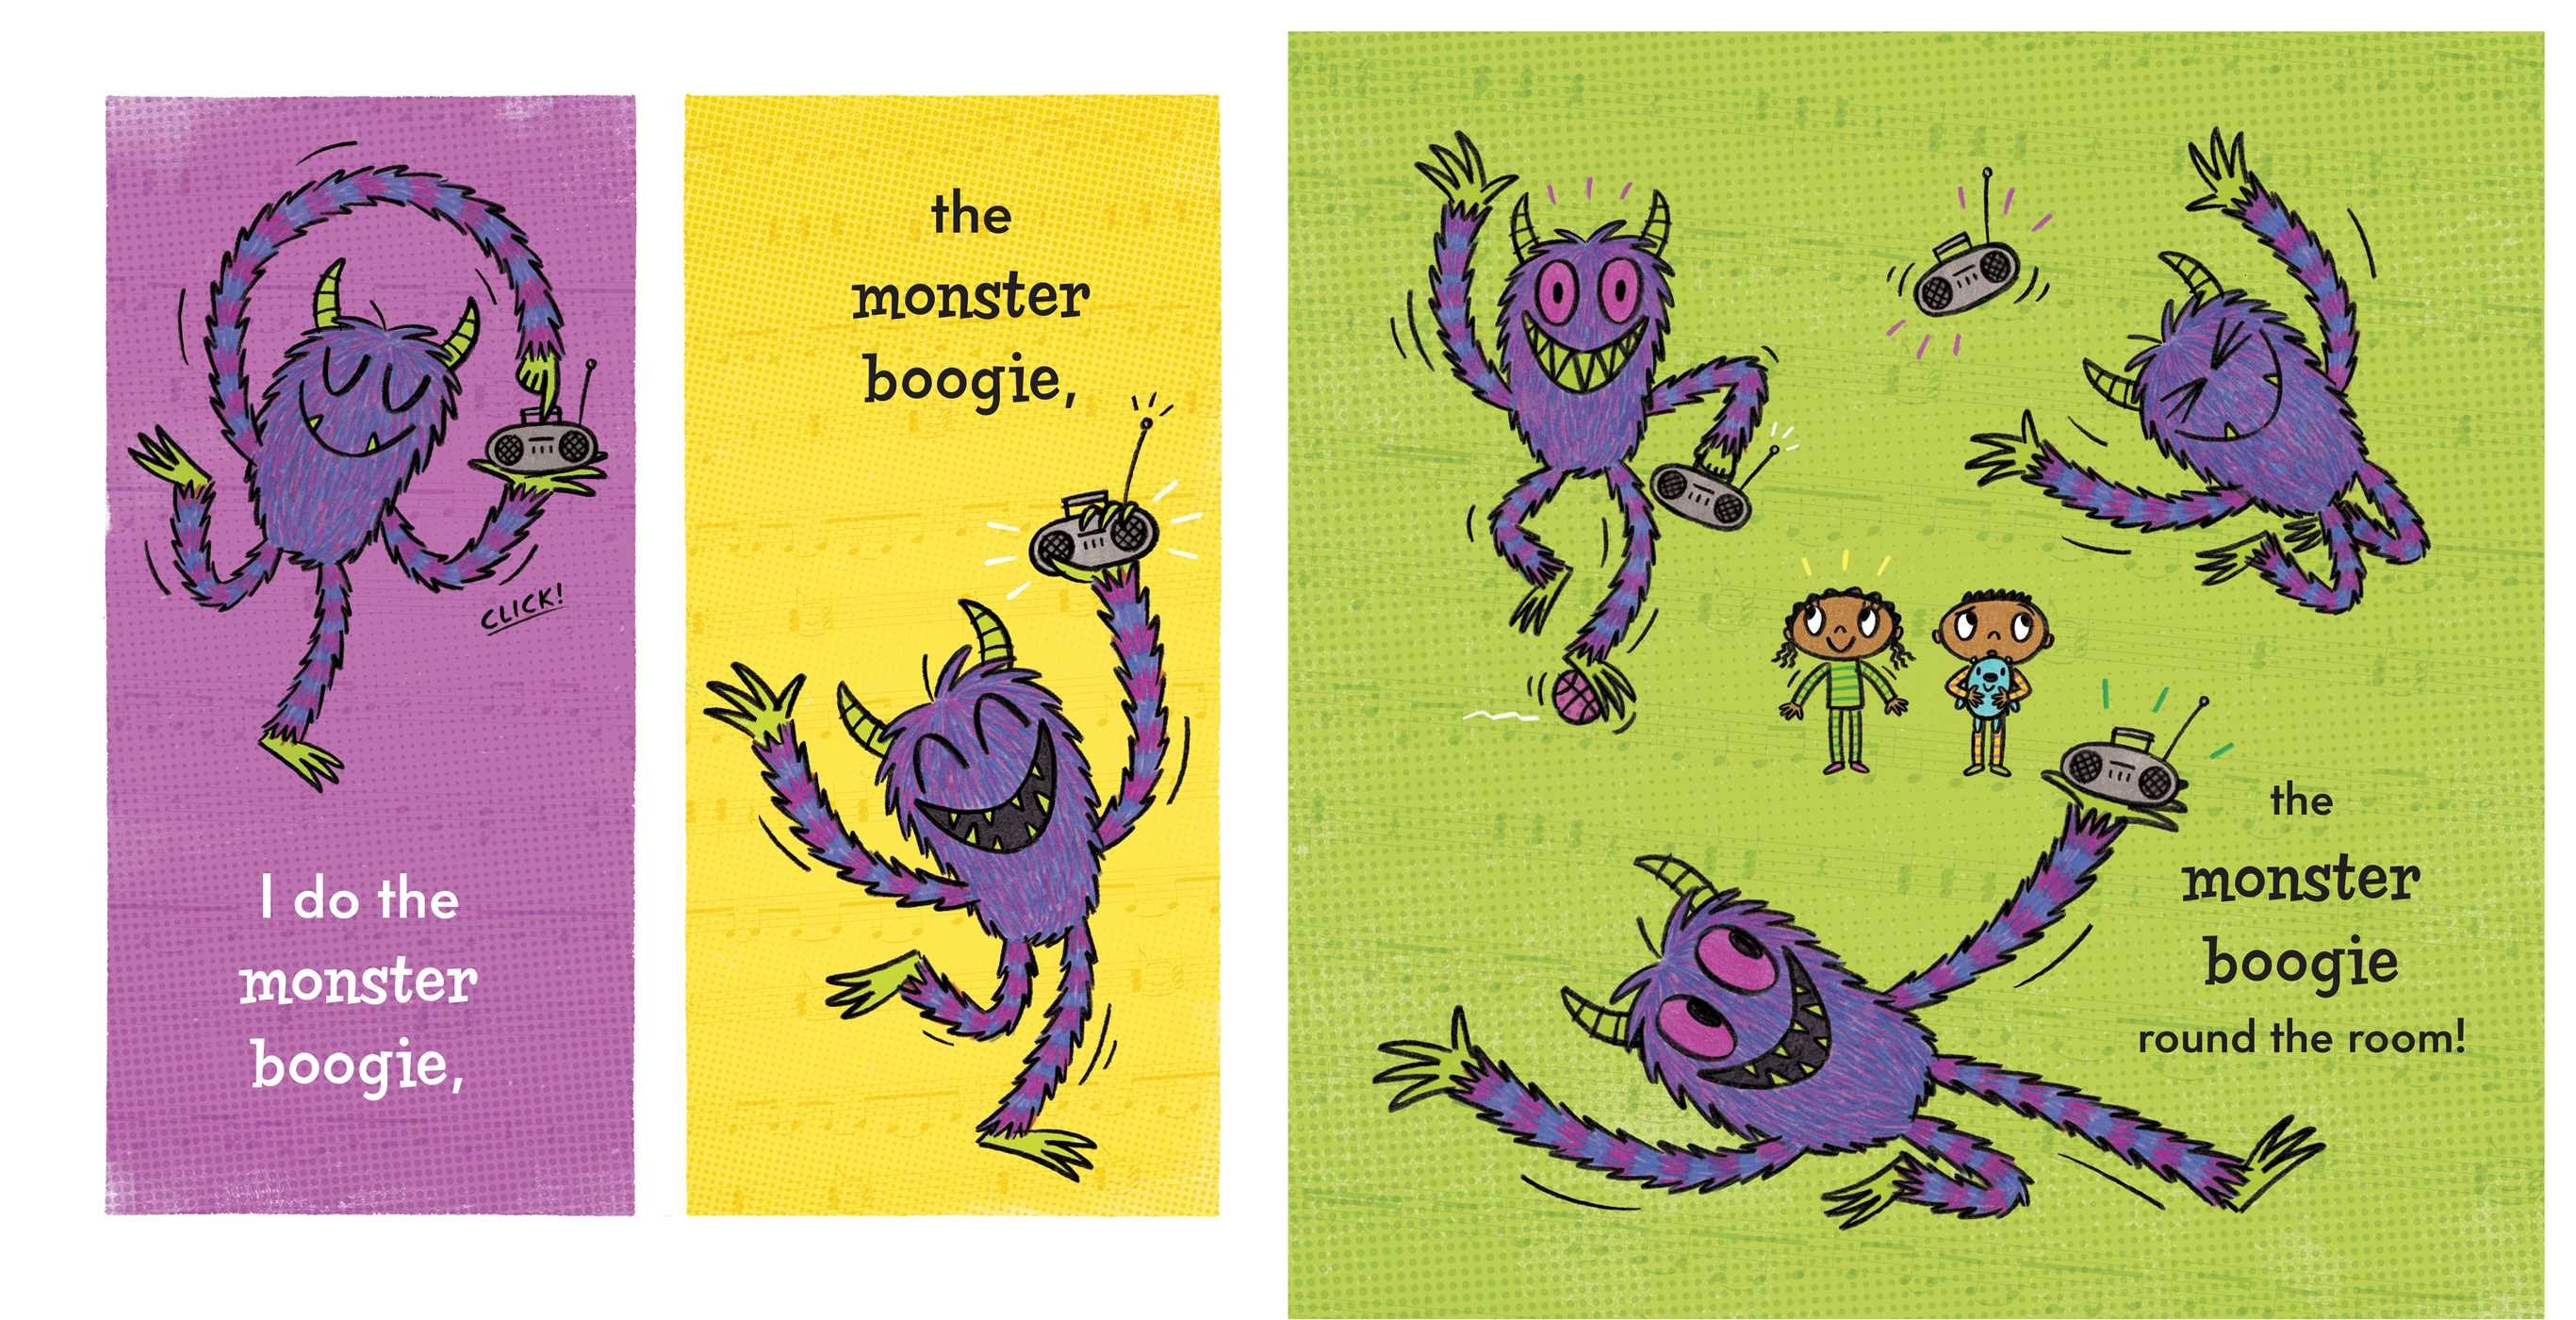 Monster boogie 9781481464659.in05